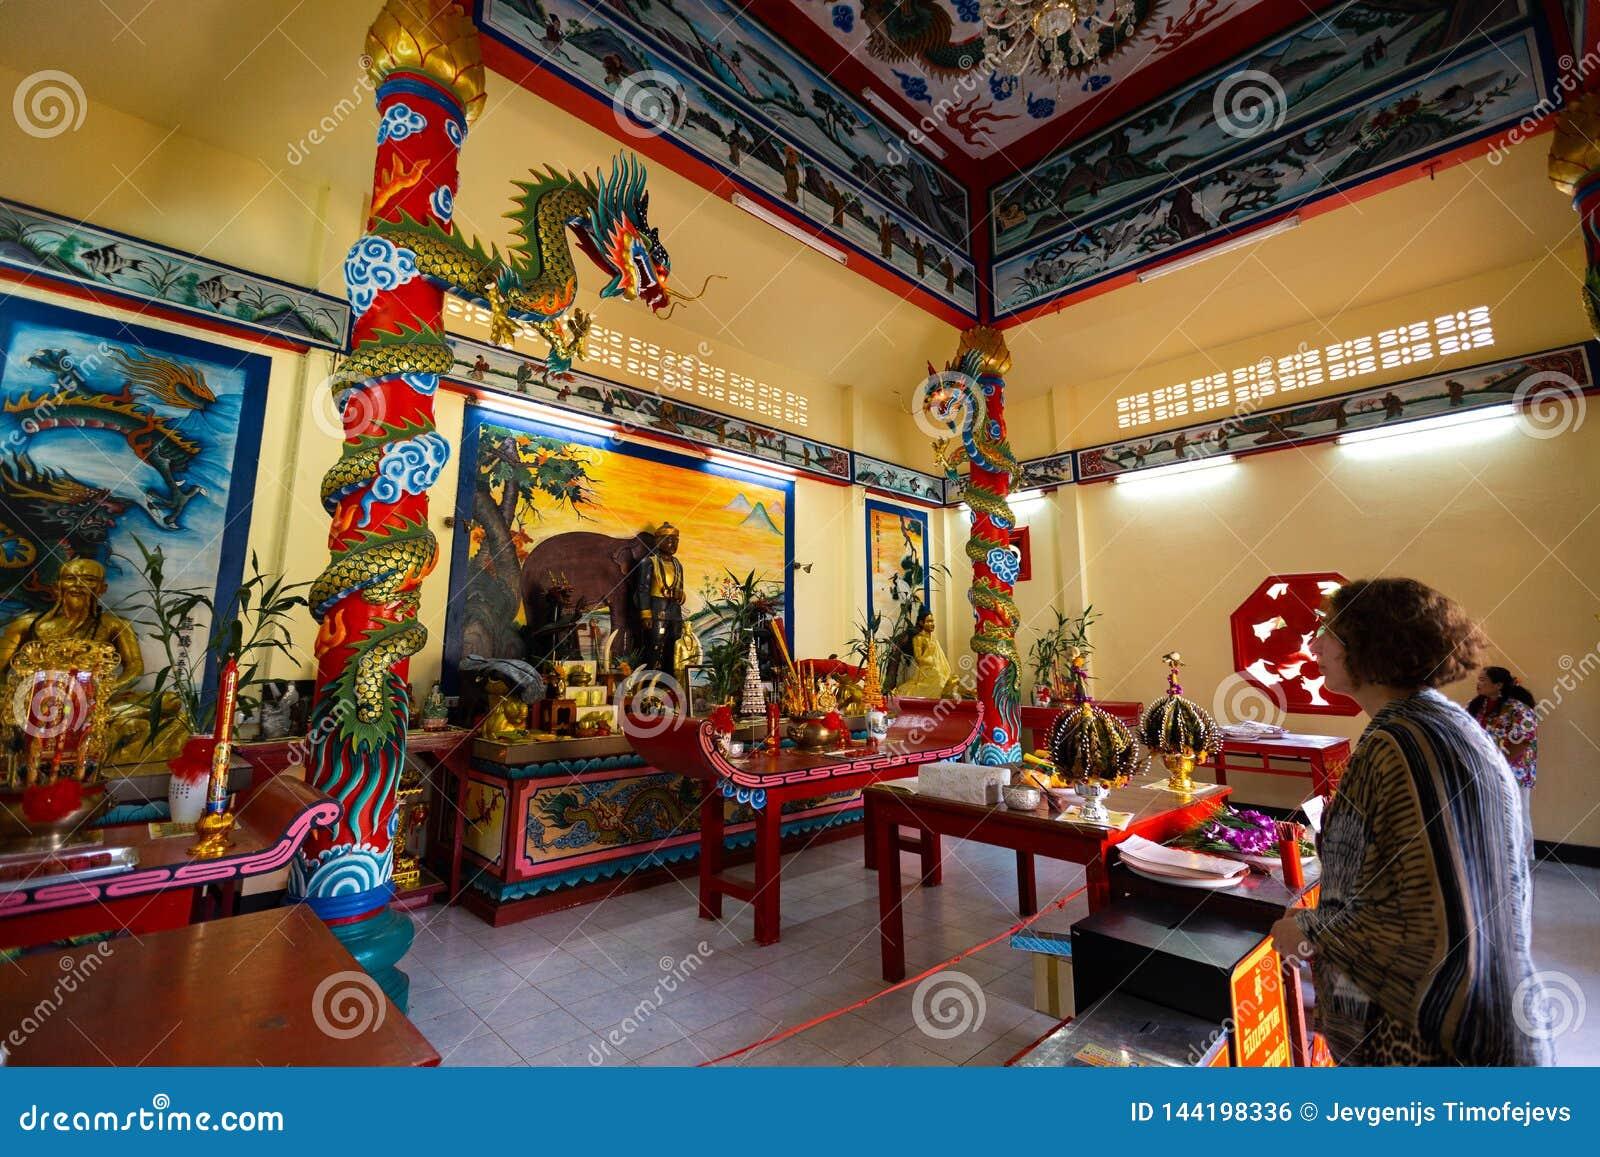 KO张,泰国- 2018年4月10日:中国buddist寺庙在海岛的北部地区-象形文字和样式